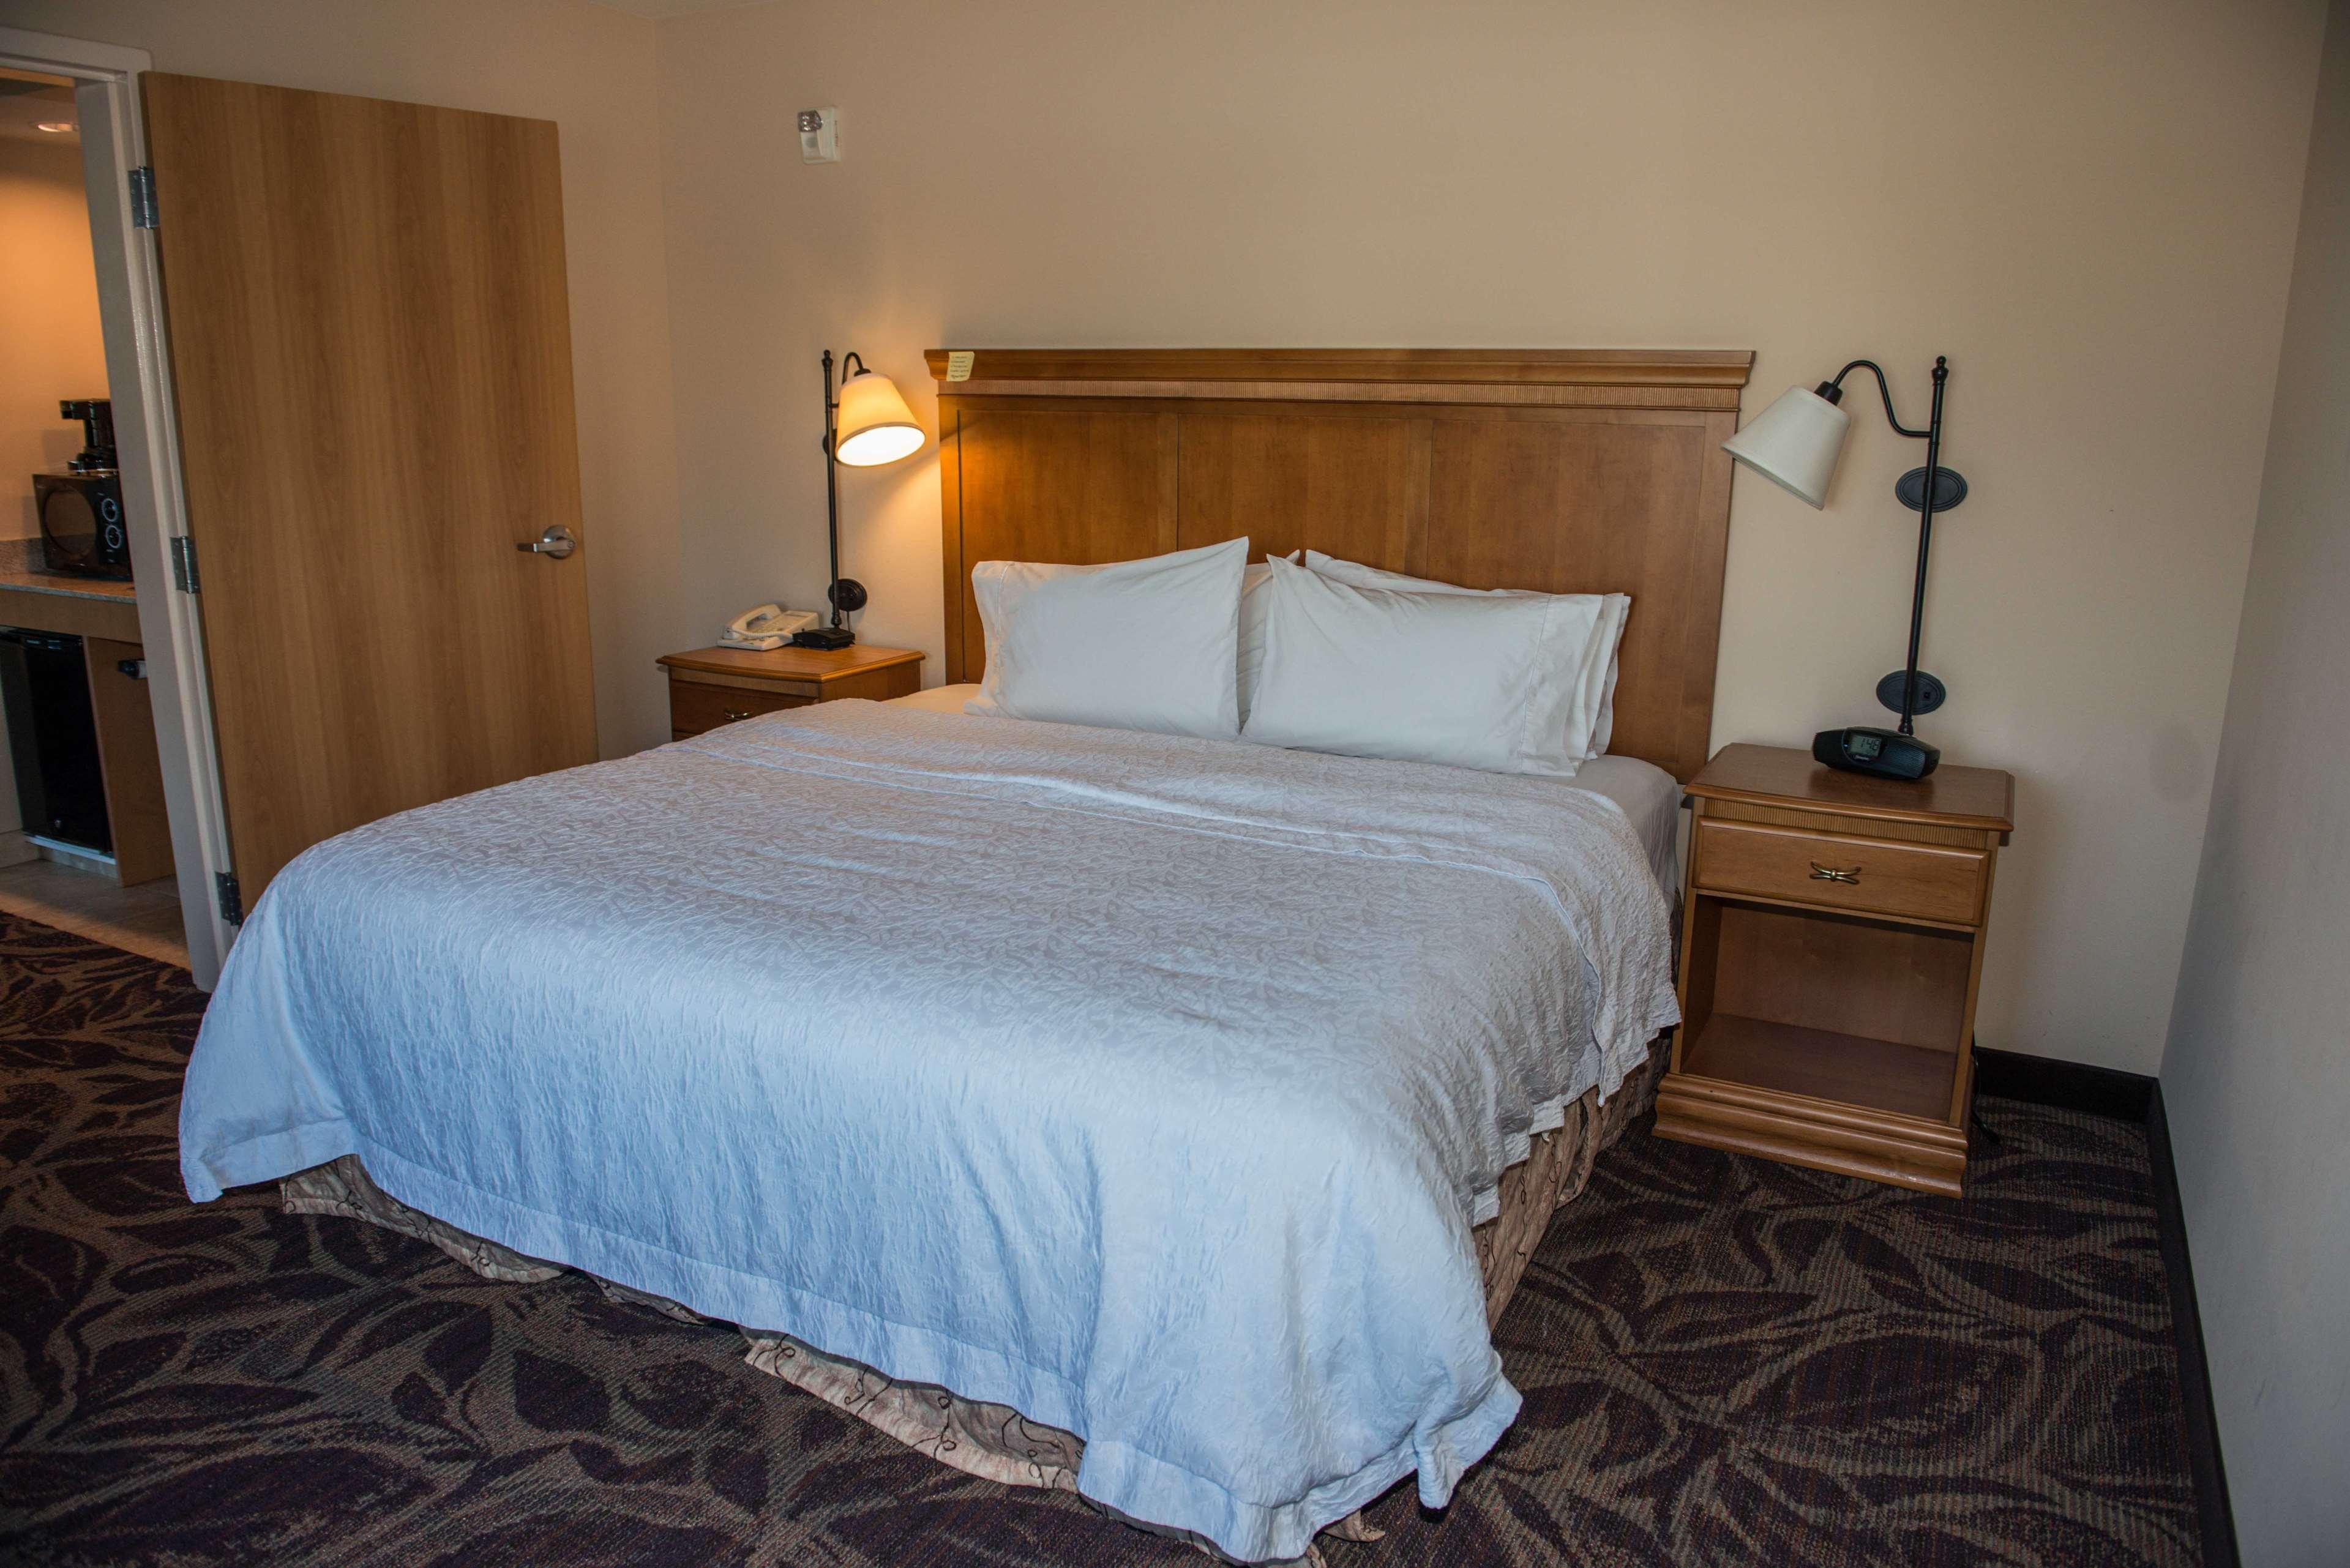 Hampton Inn & Suites Bremerton image 49